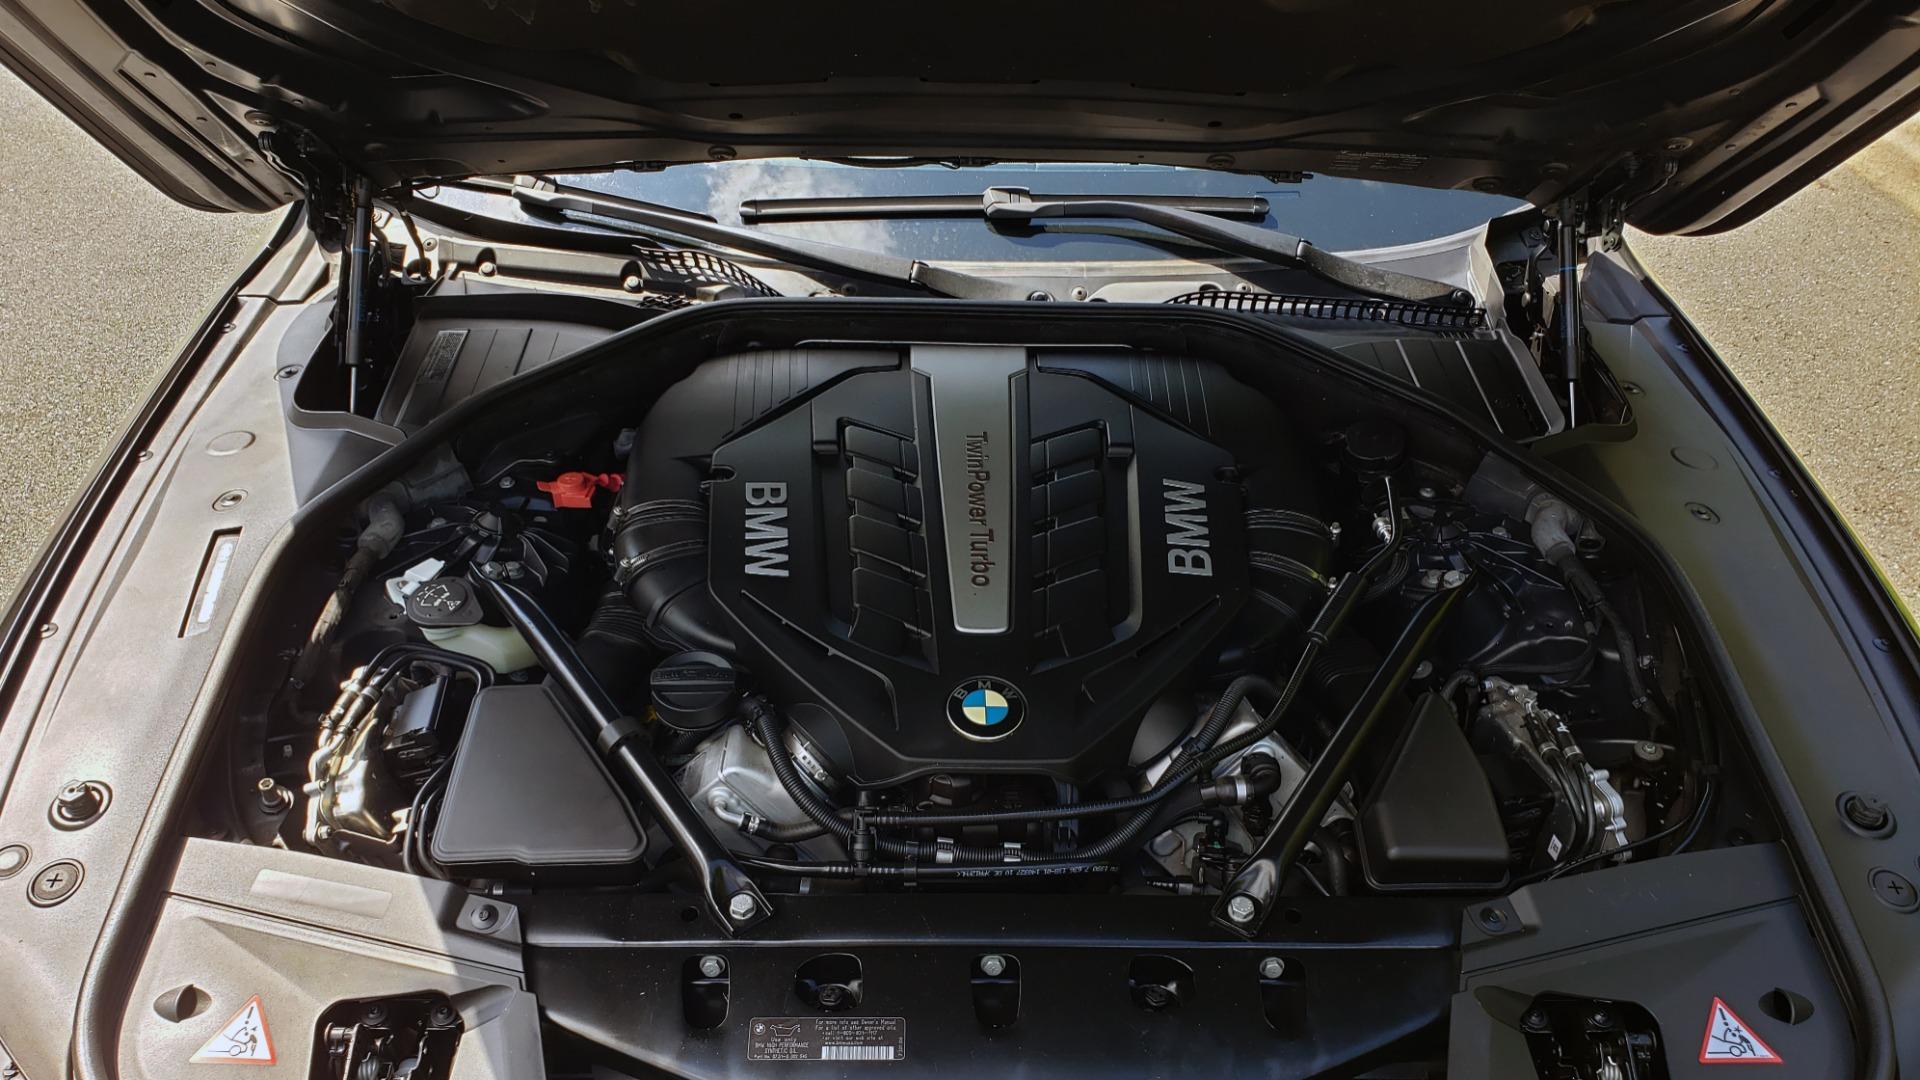 Used 2014 BMW 7 SERIES 750LI M-SPORT / EXEC PKG / DRVR ASST / LIGHTING / NAV / SUNROOF for sale Sold at Formula Imports in Charlotte NC 28227 10